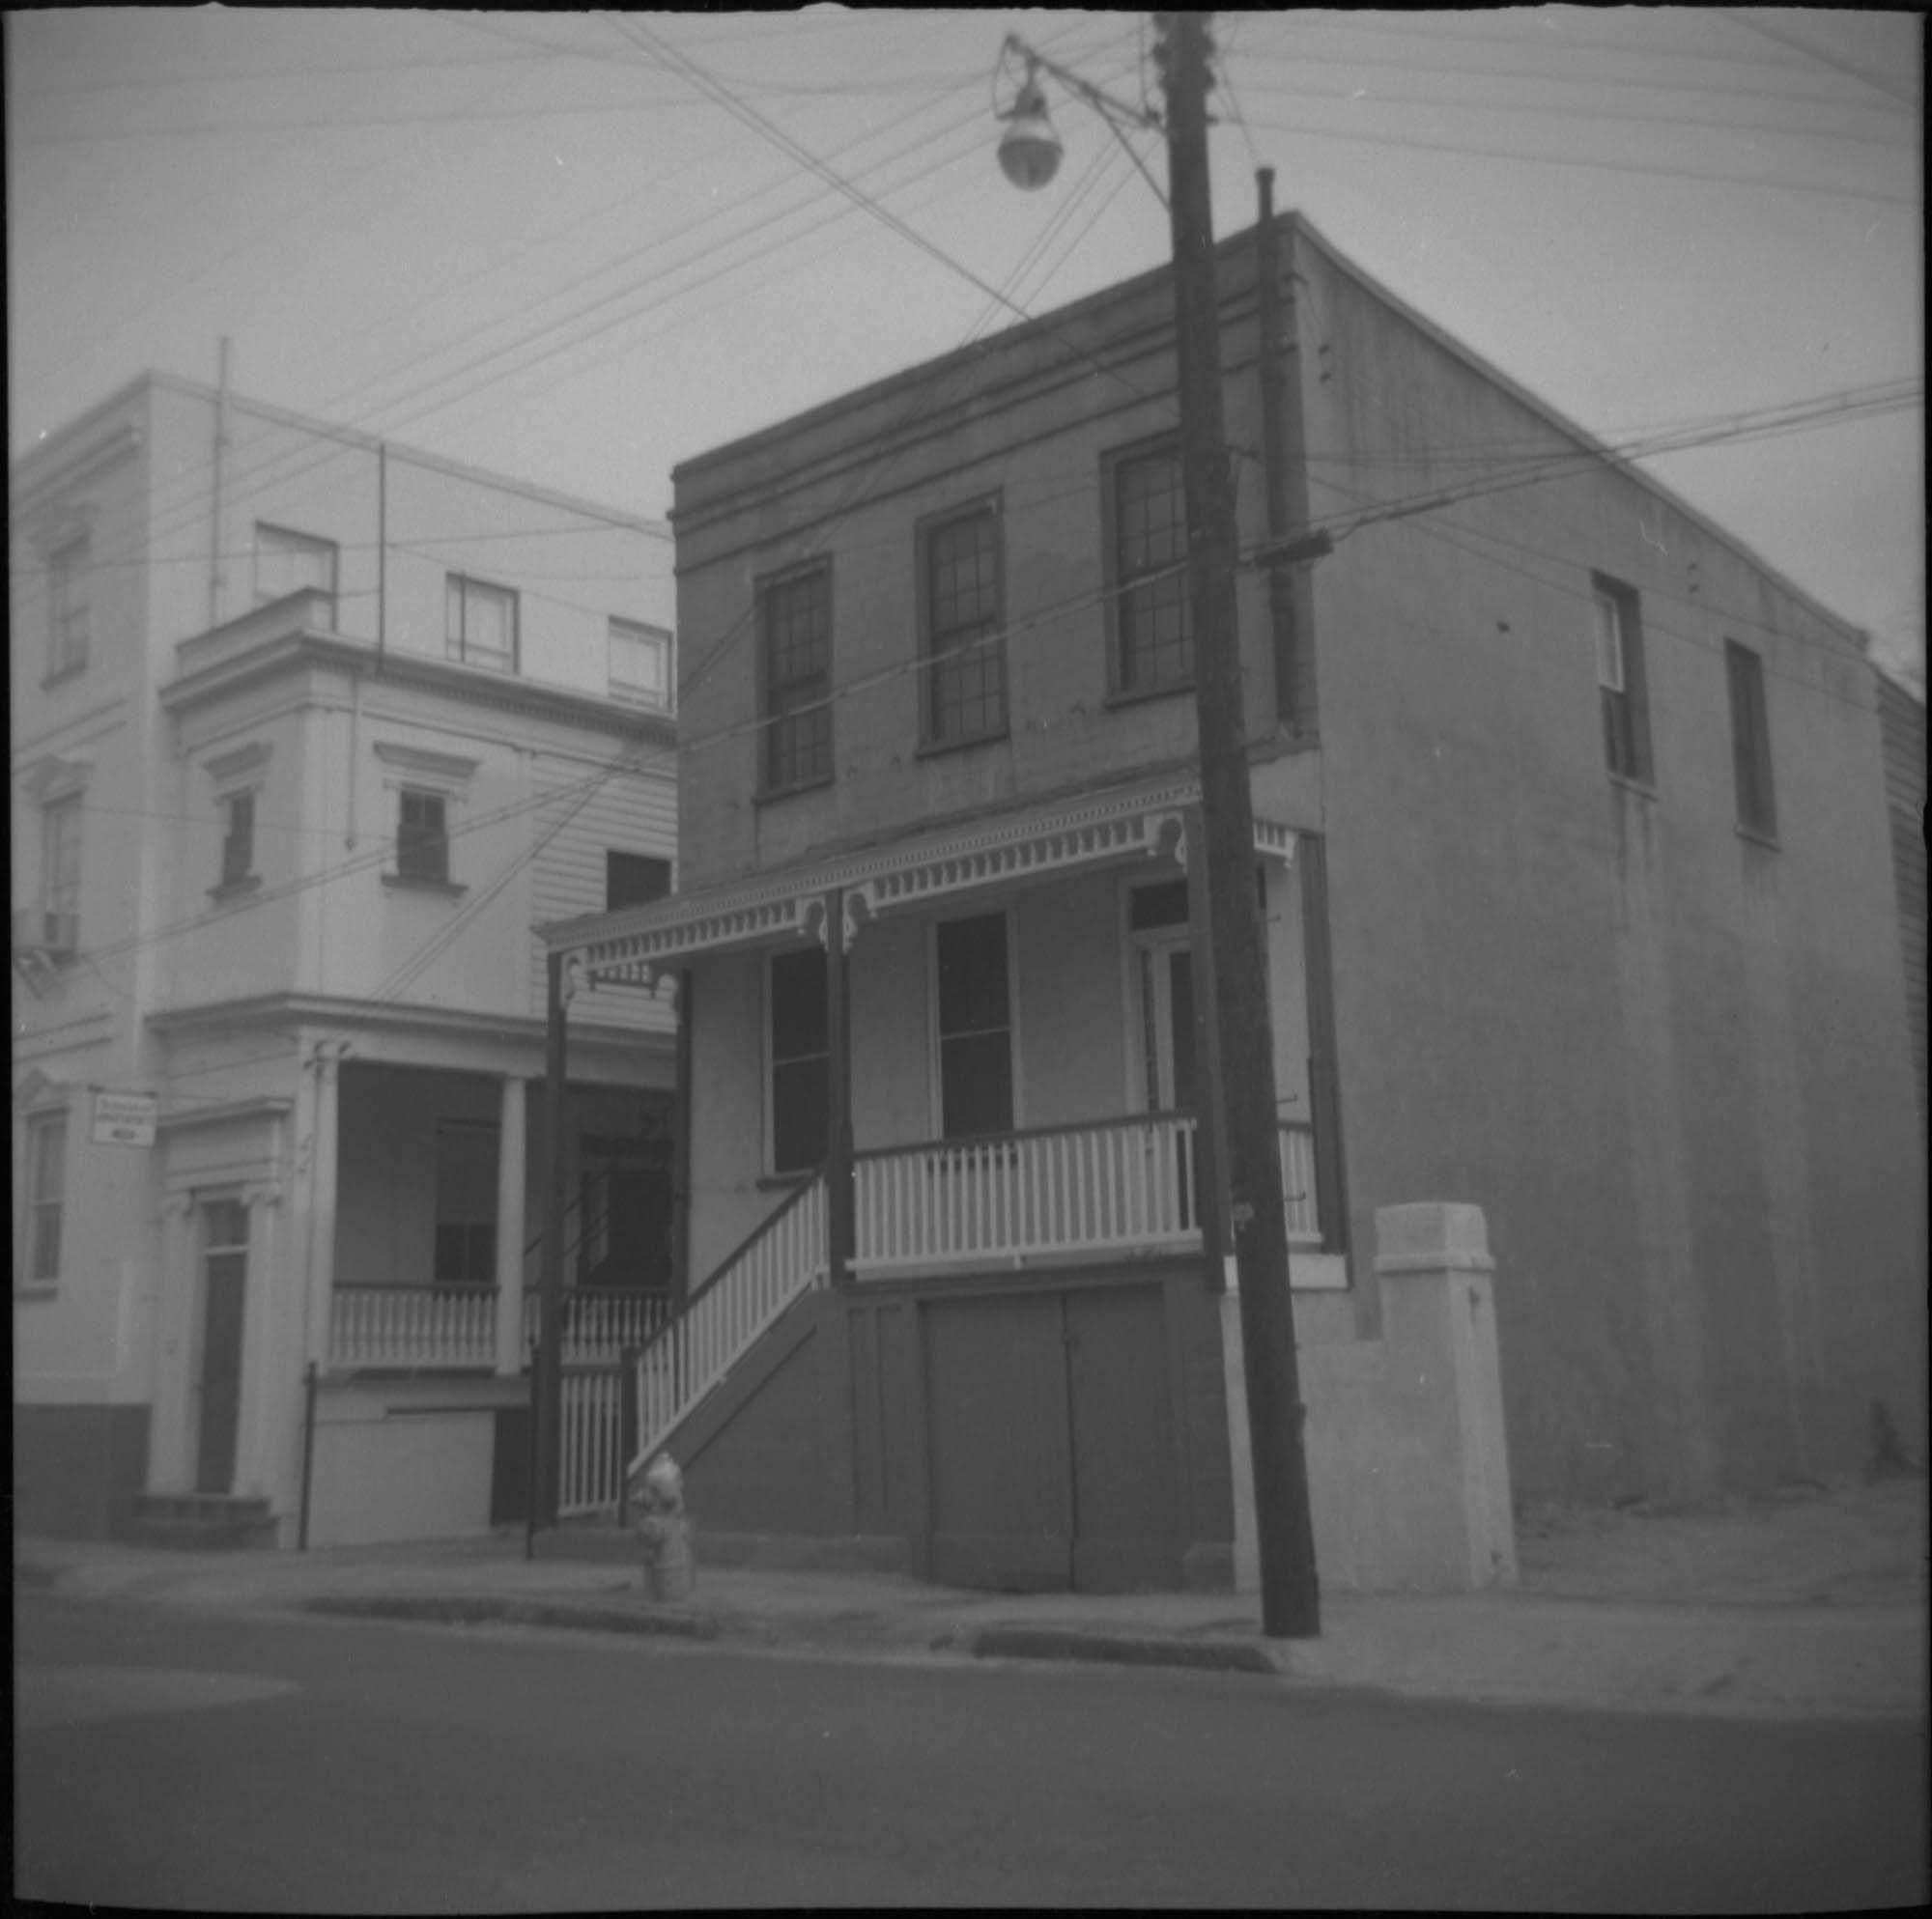 61 Society Street